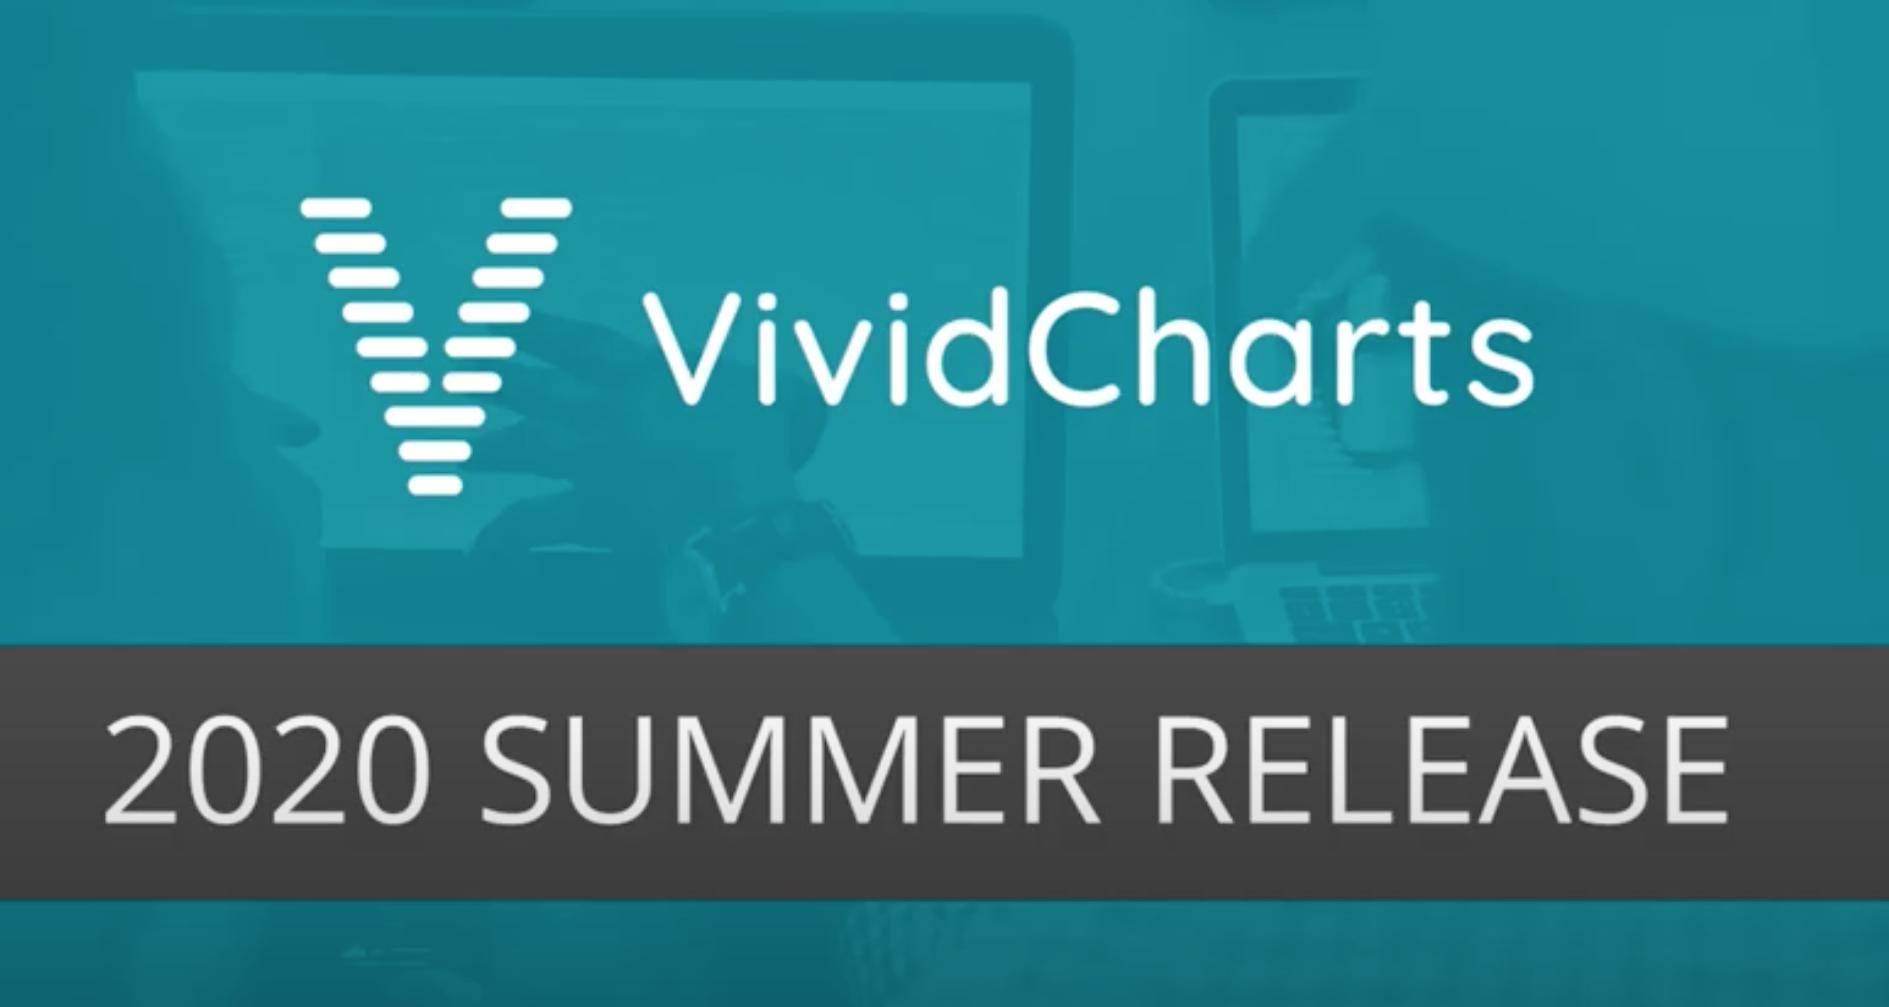 VividCharts 2020 Summer Release Is Here!